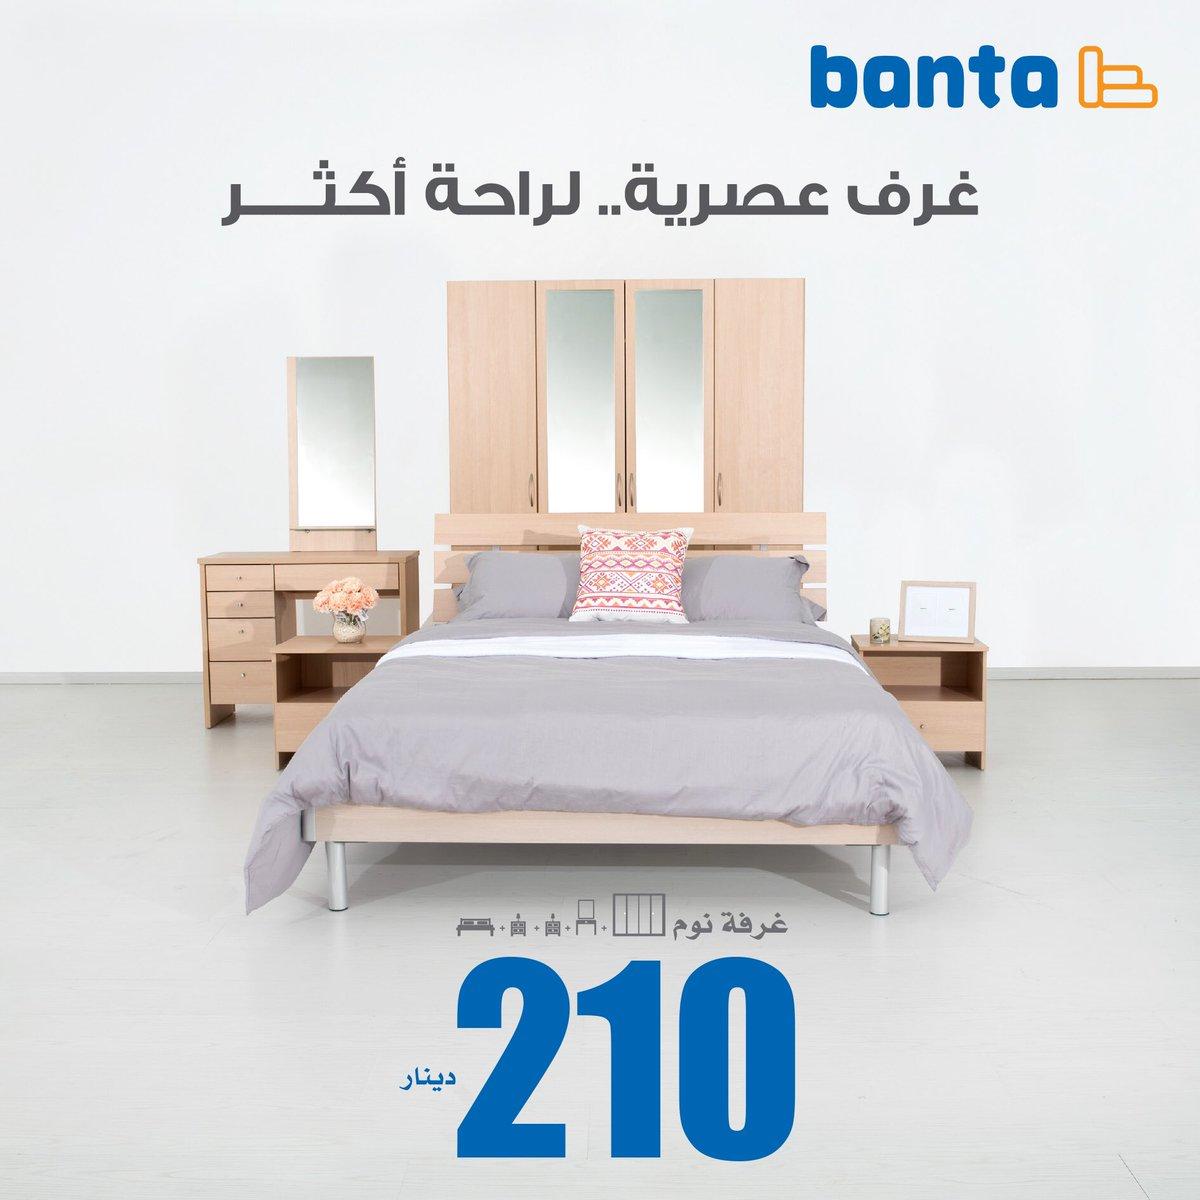 Banta on Twitter: